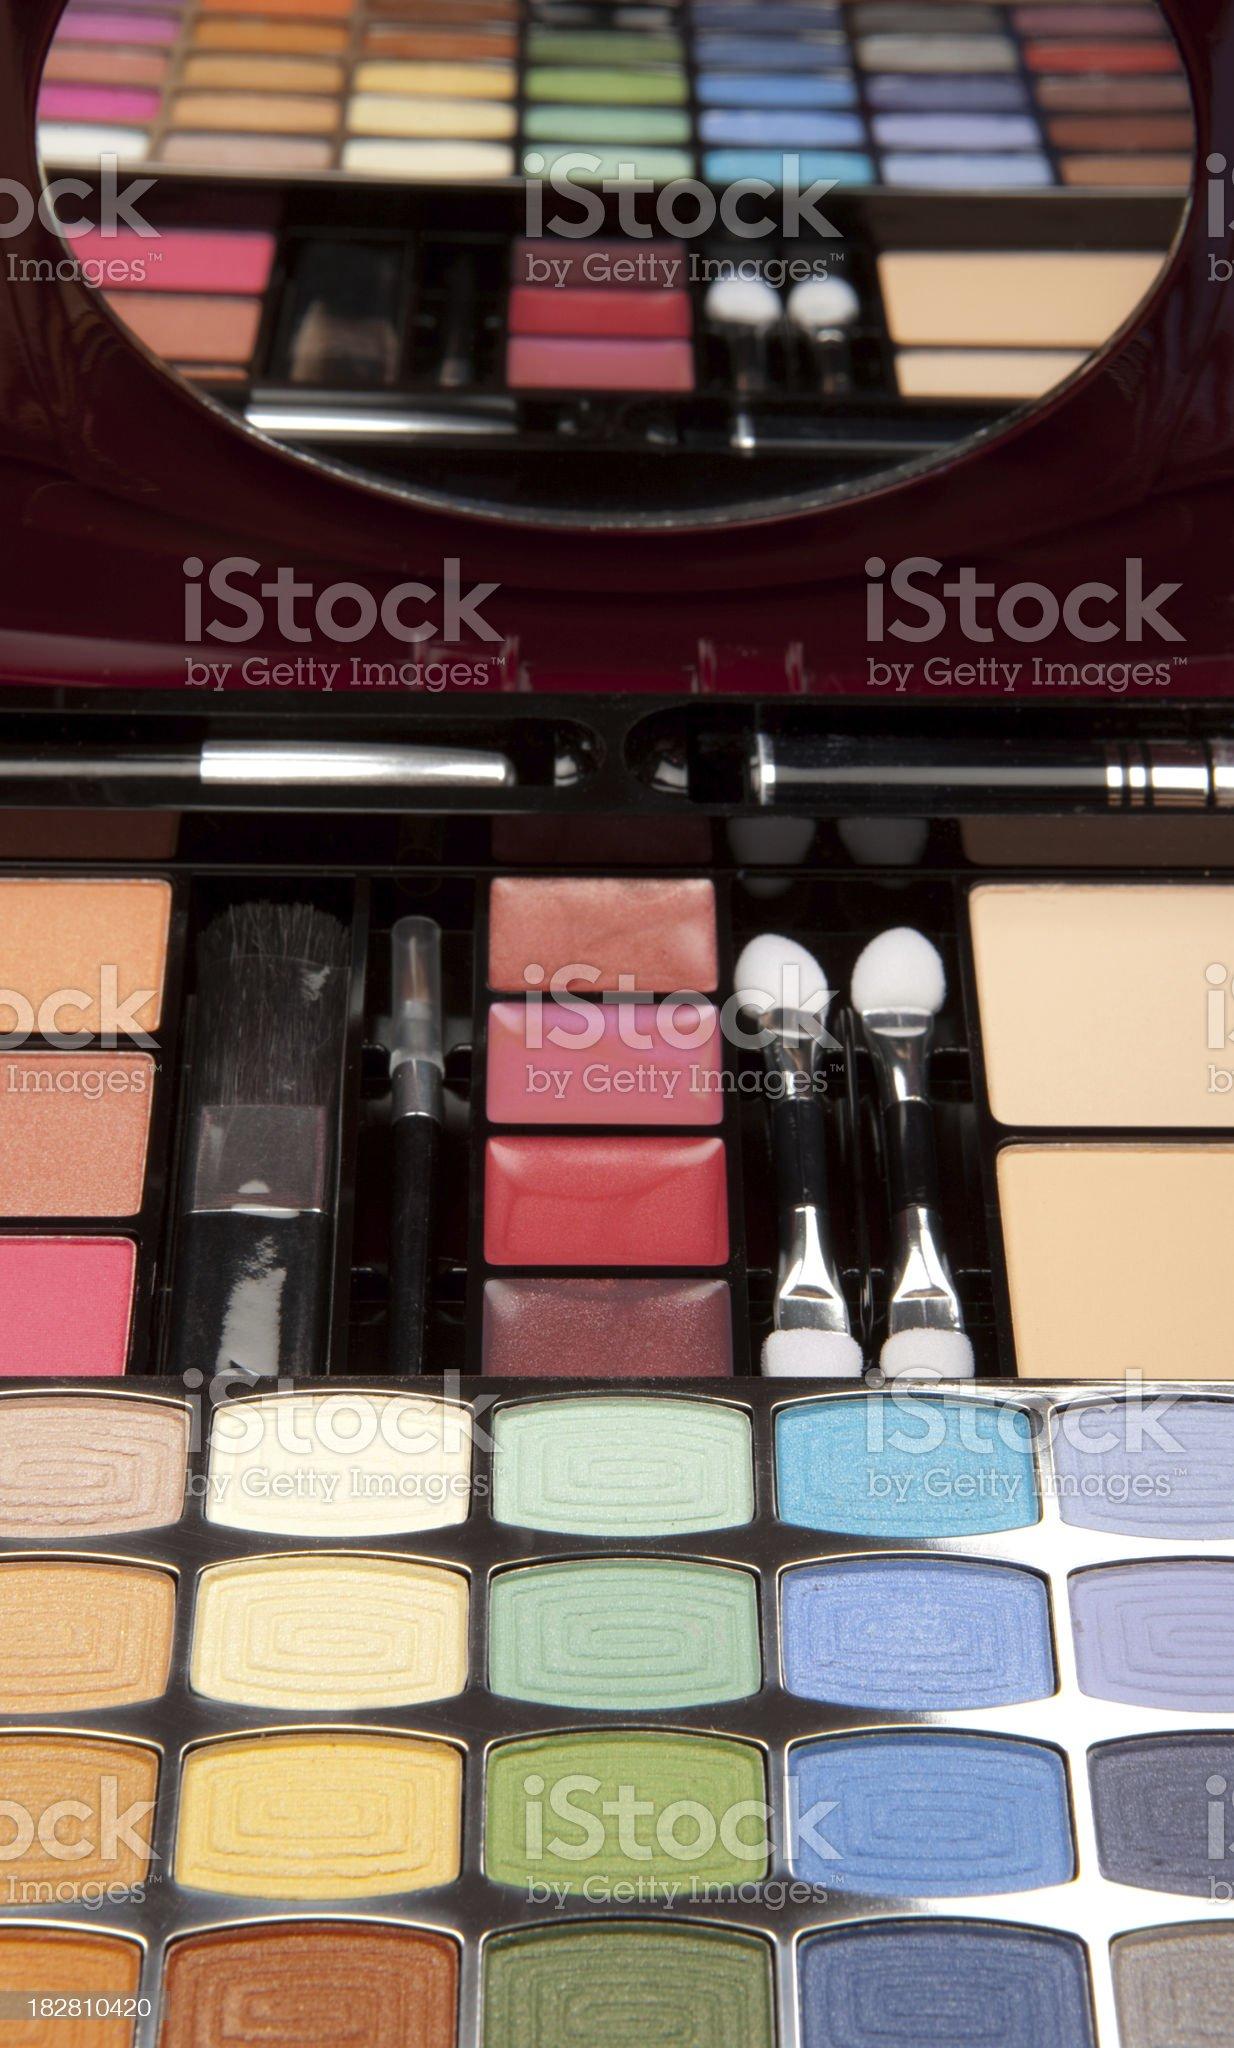 Makeup kit royalty-free stock photo